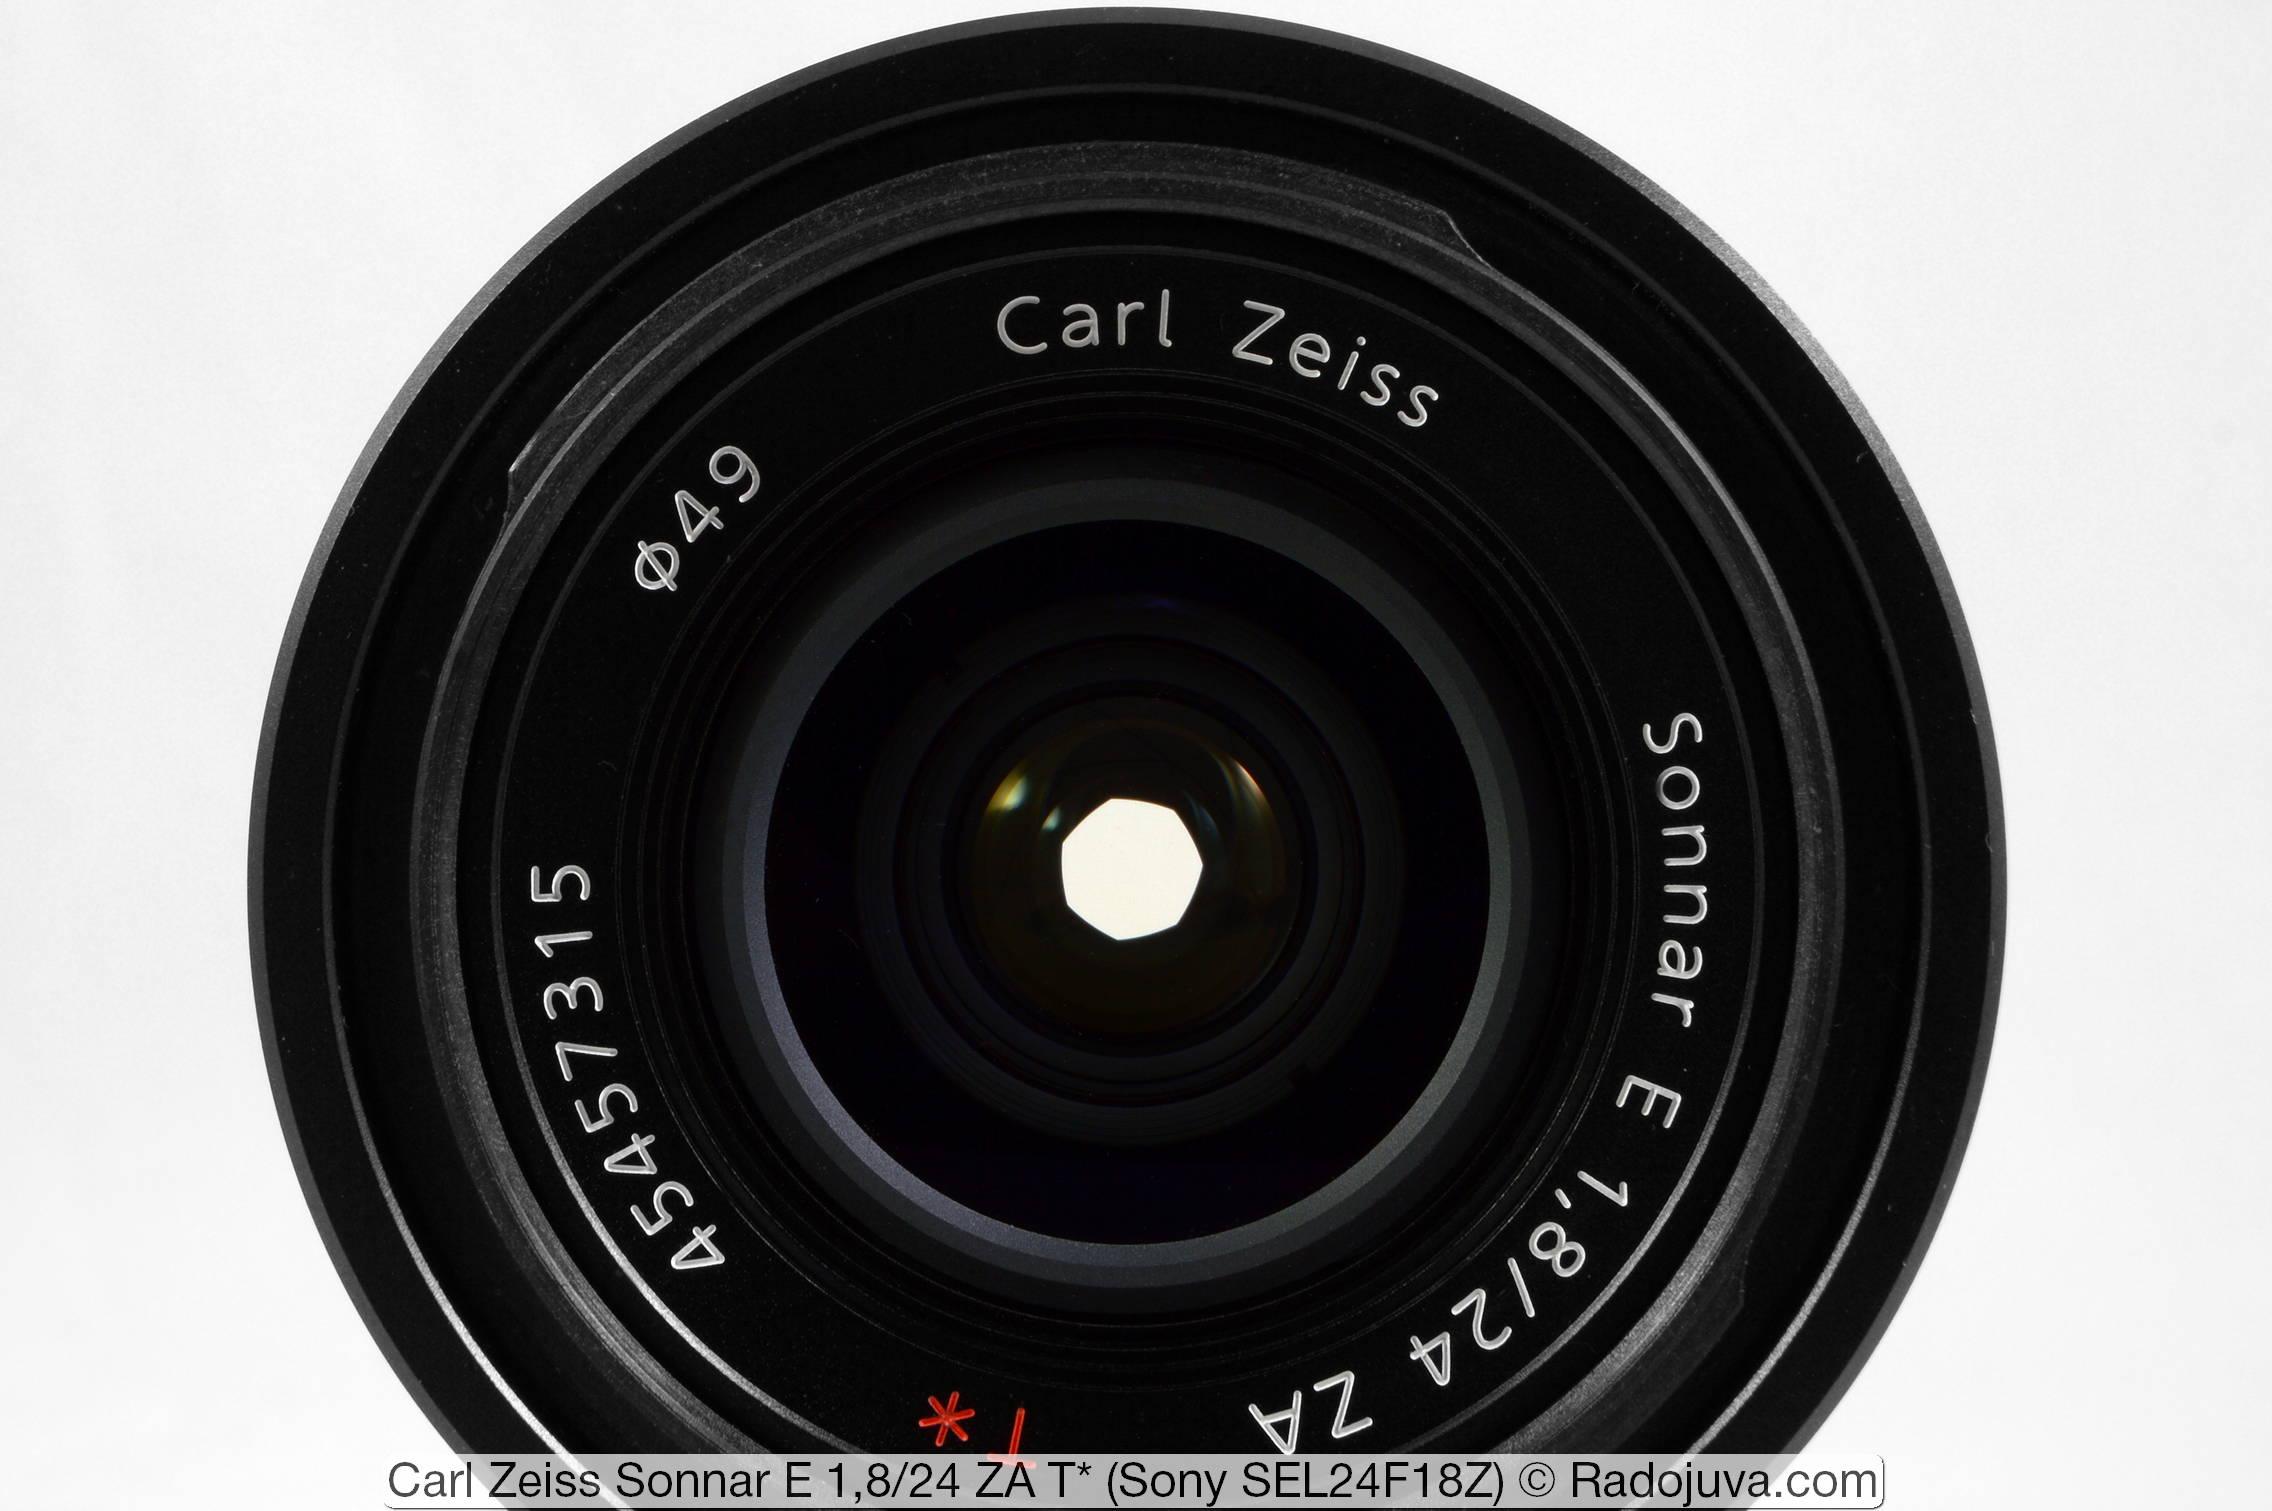 Carl Zeiss Sonnar E 1,8/24 ZA T* (Sony SEL24F18Z)